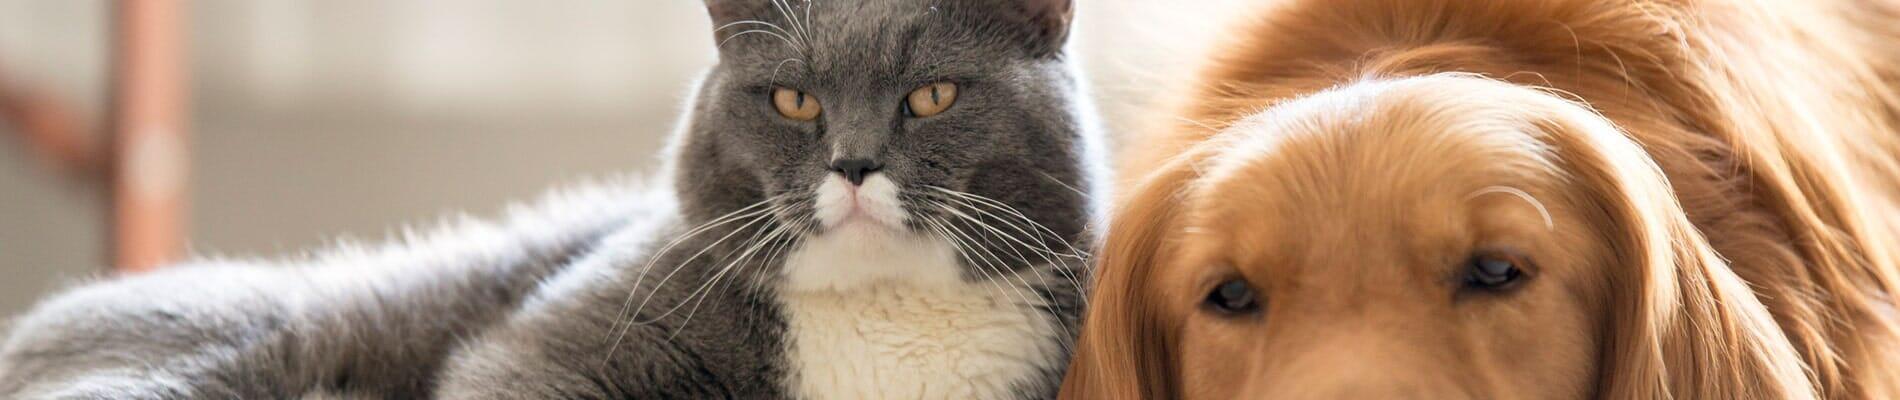 Cat and Dog   Kaggle